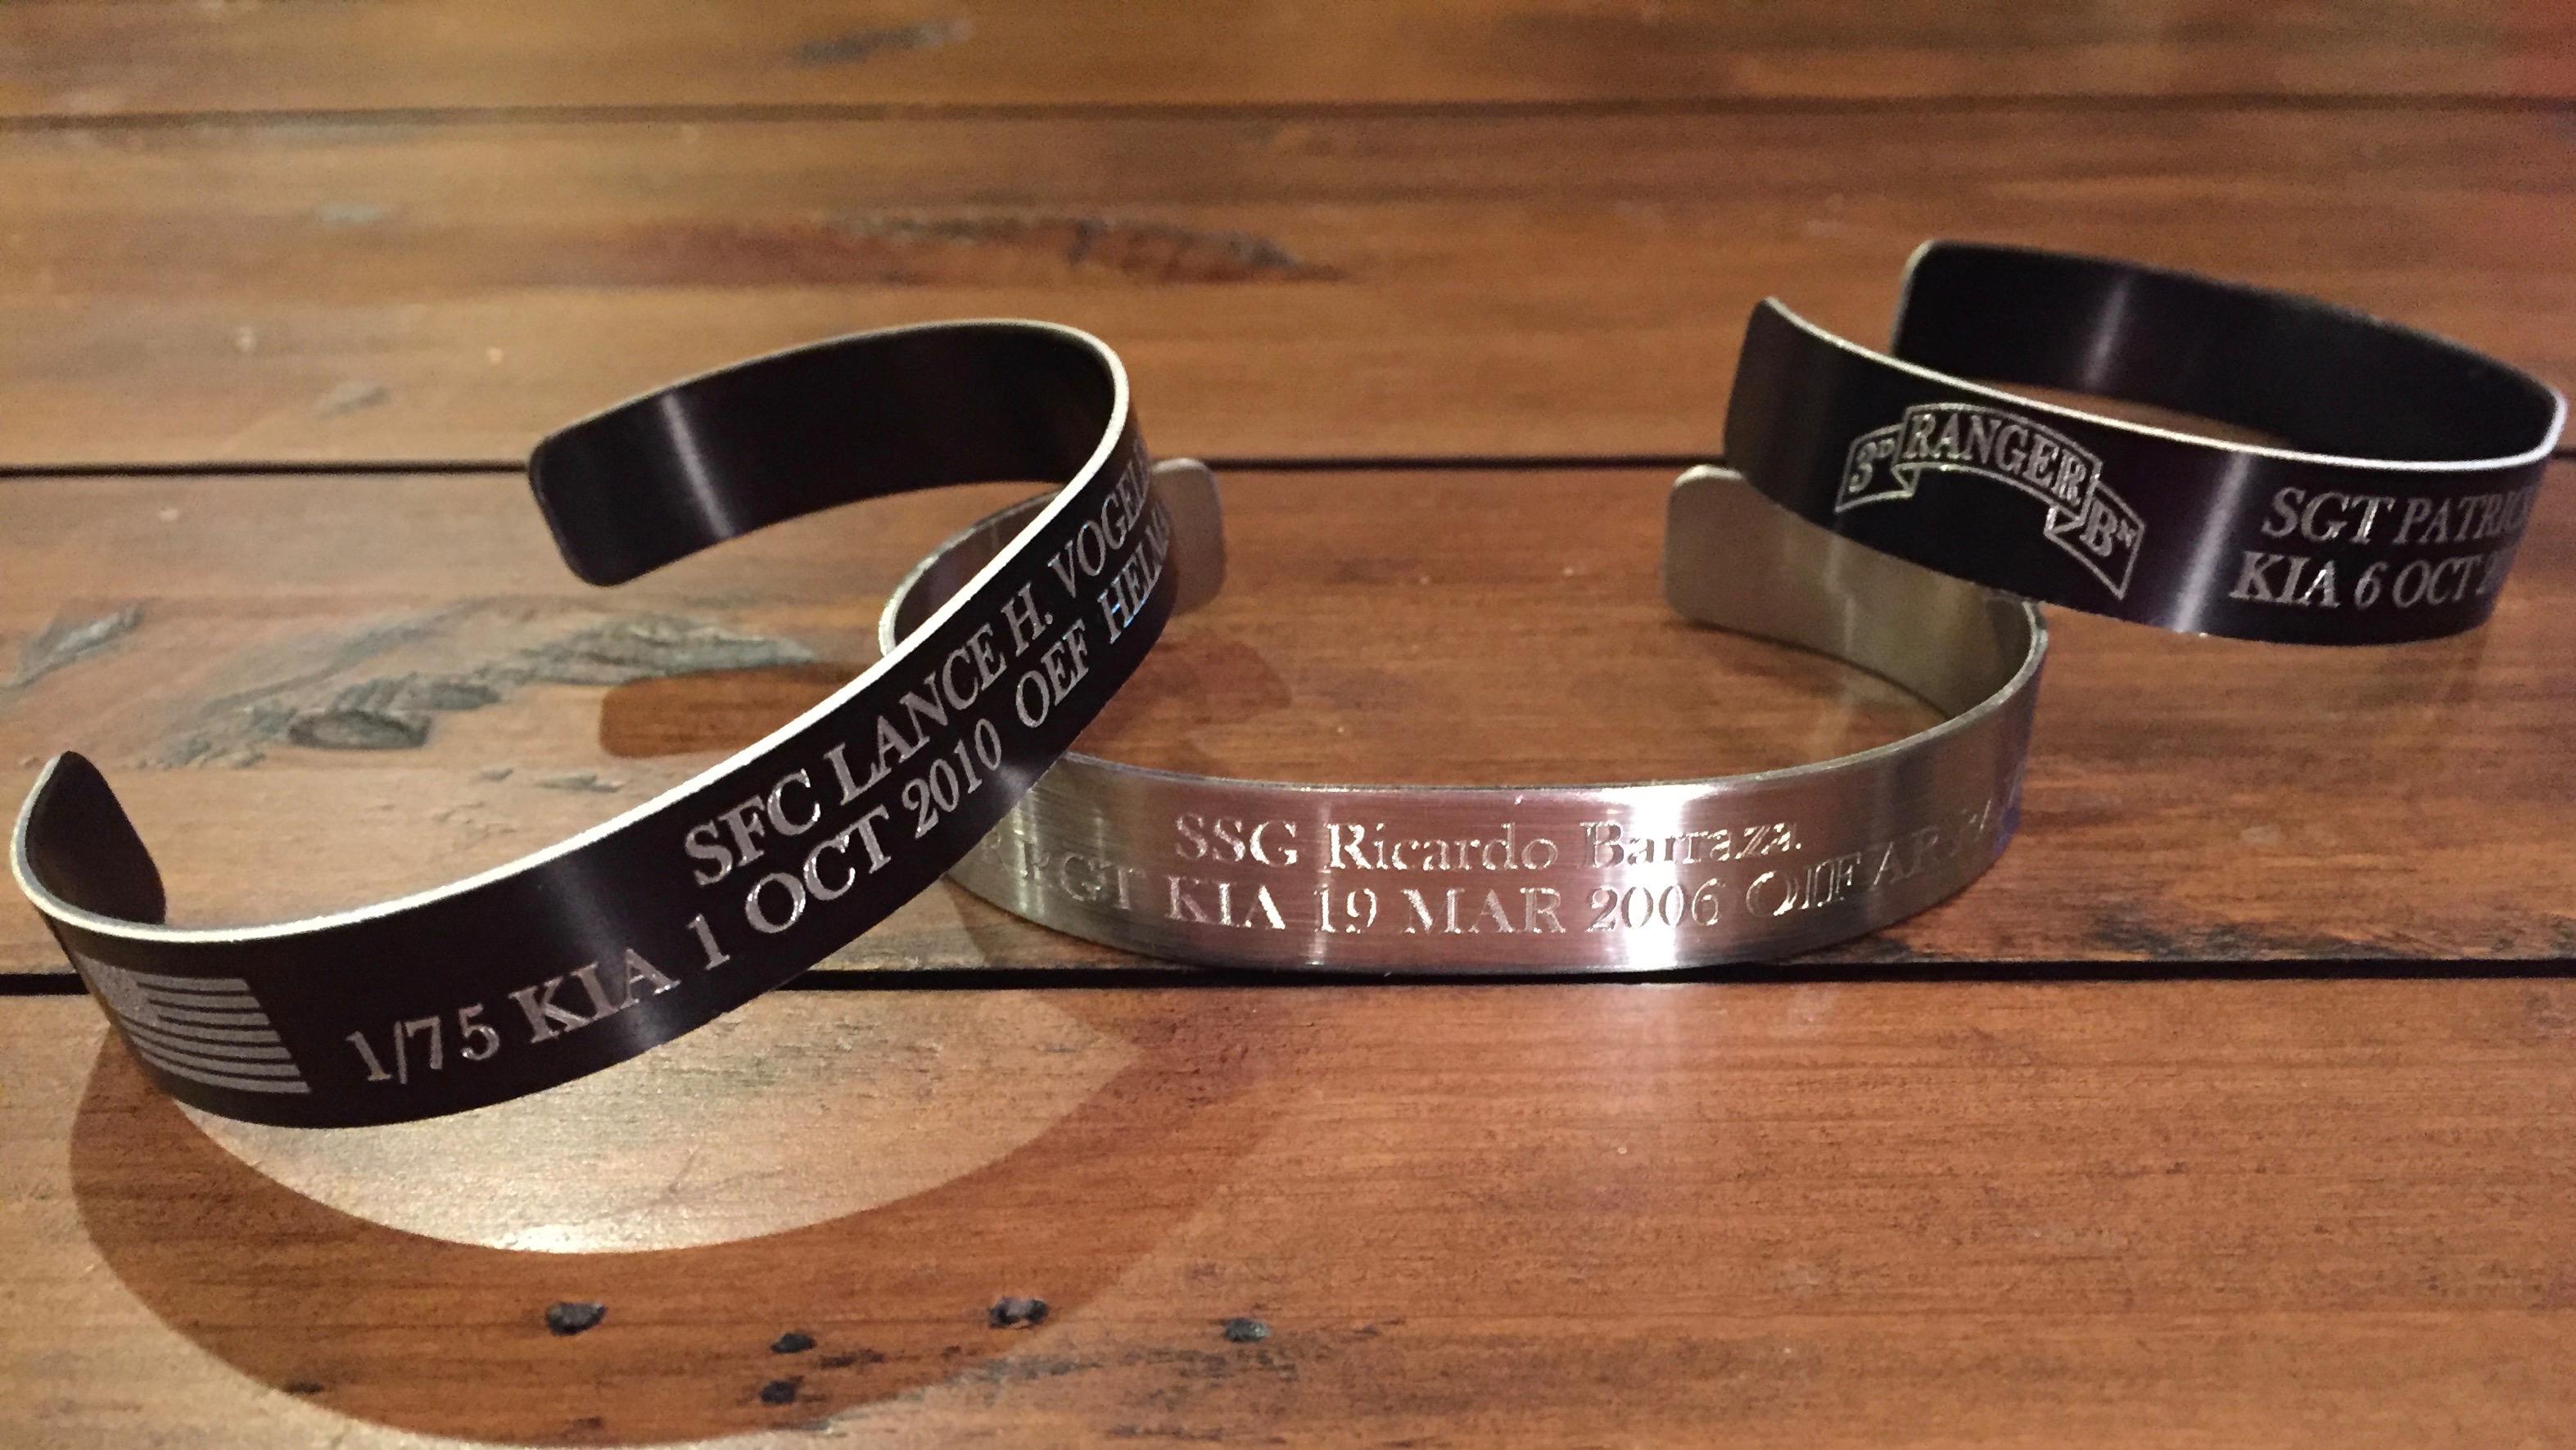 designs designsbycooties com rubber bracelet memorial male military fundraiser alert heroes wristbandemorial bracelets kia